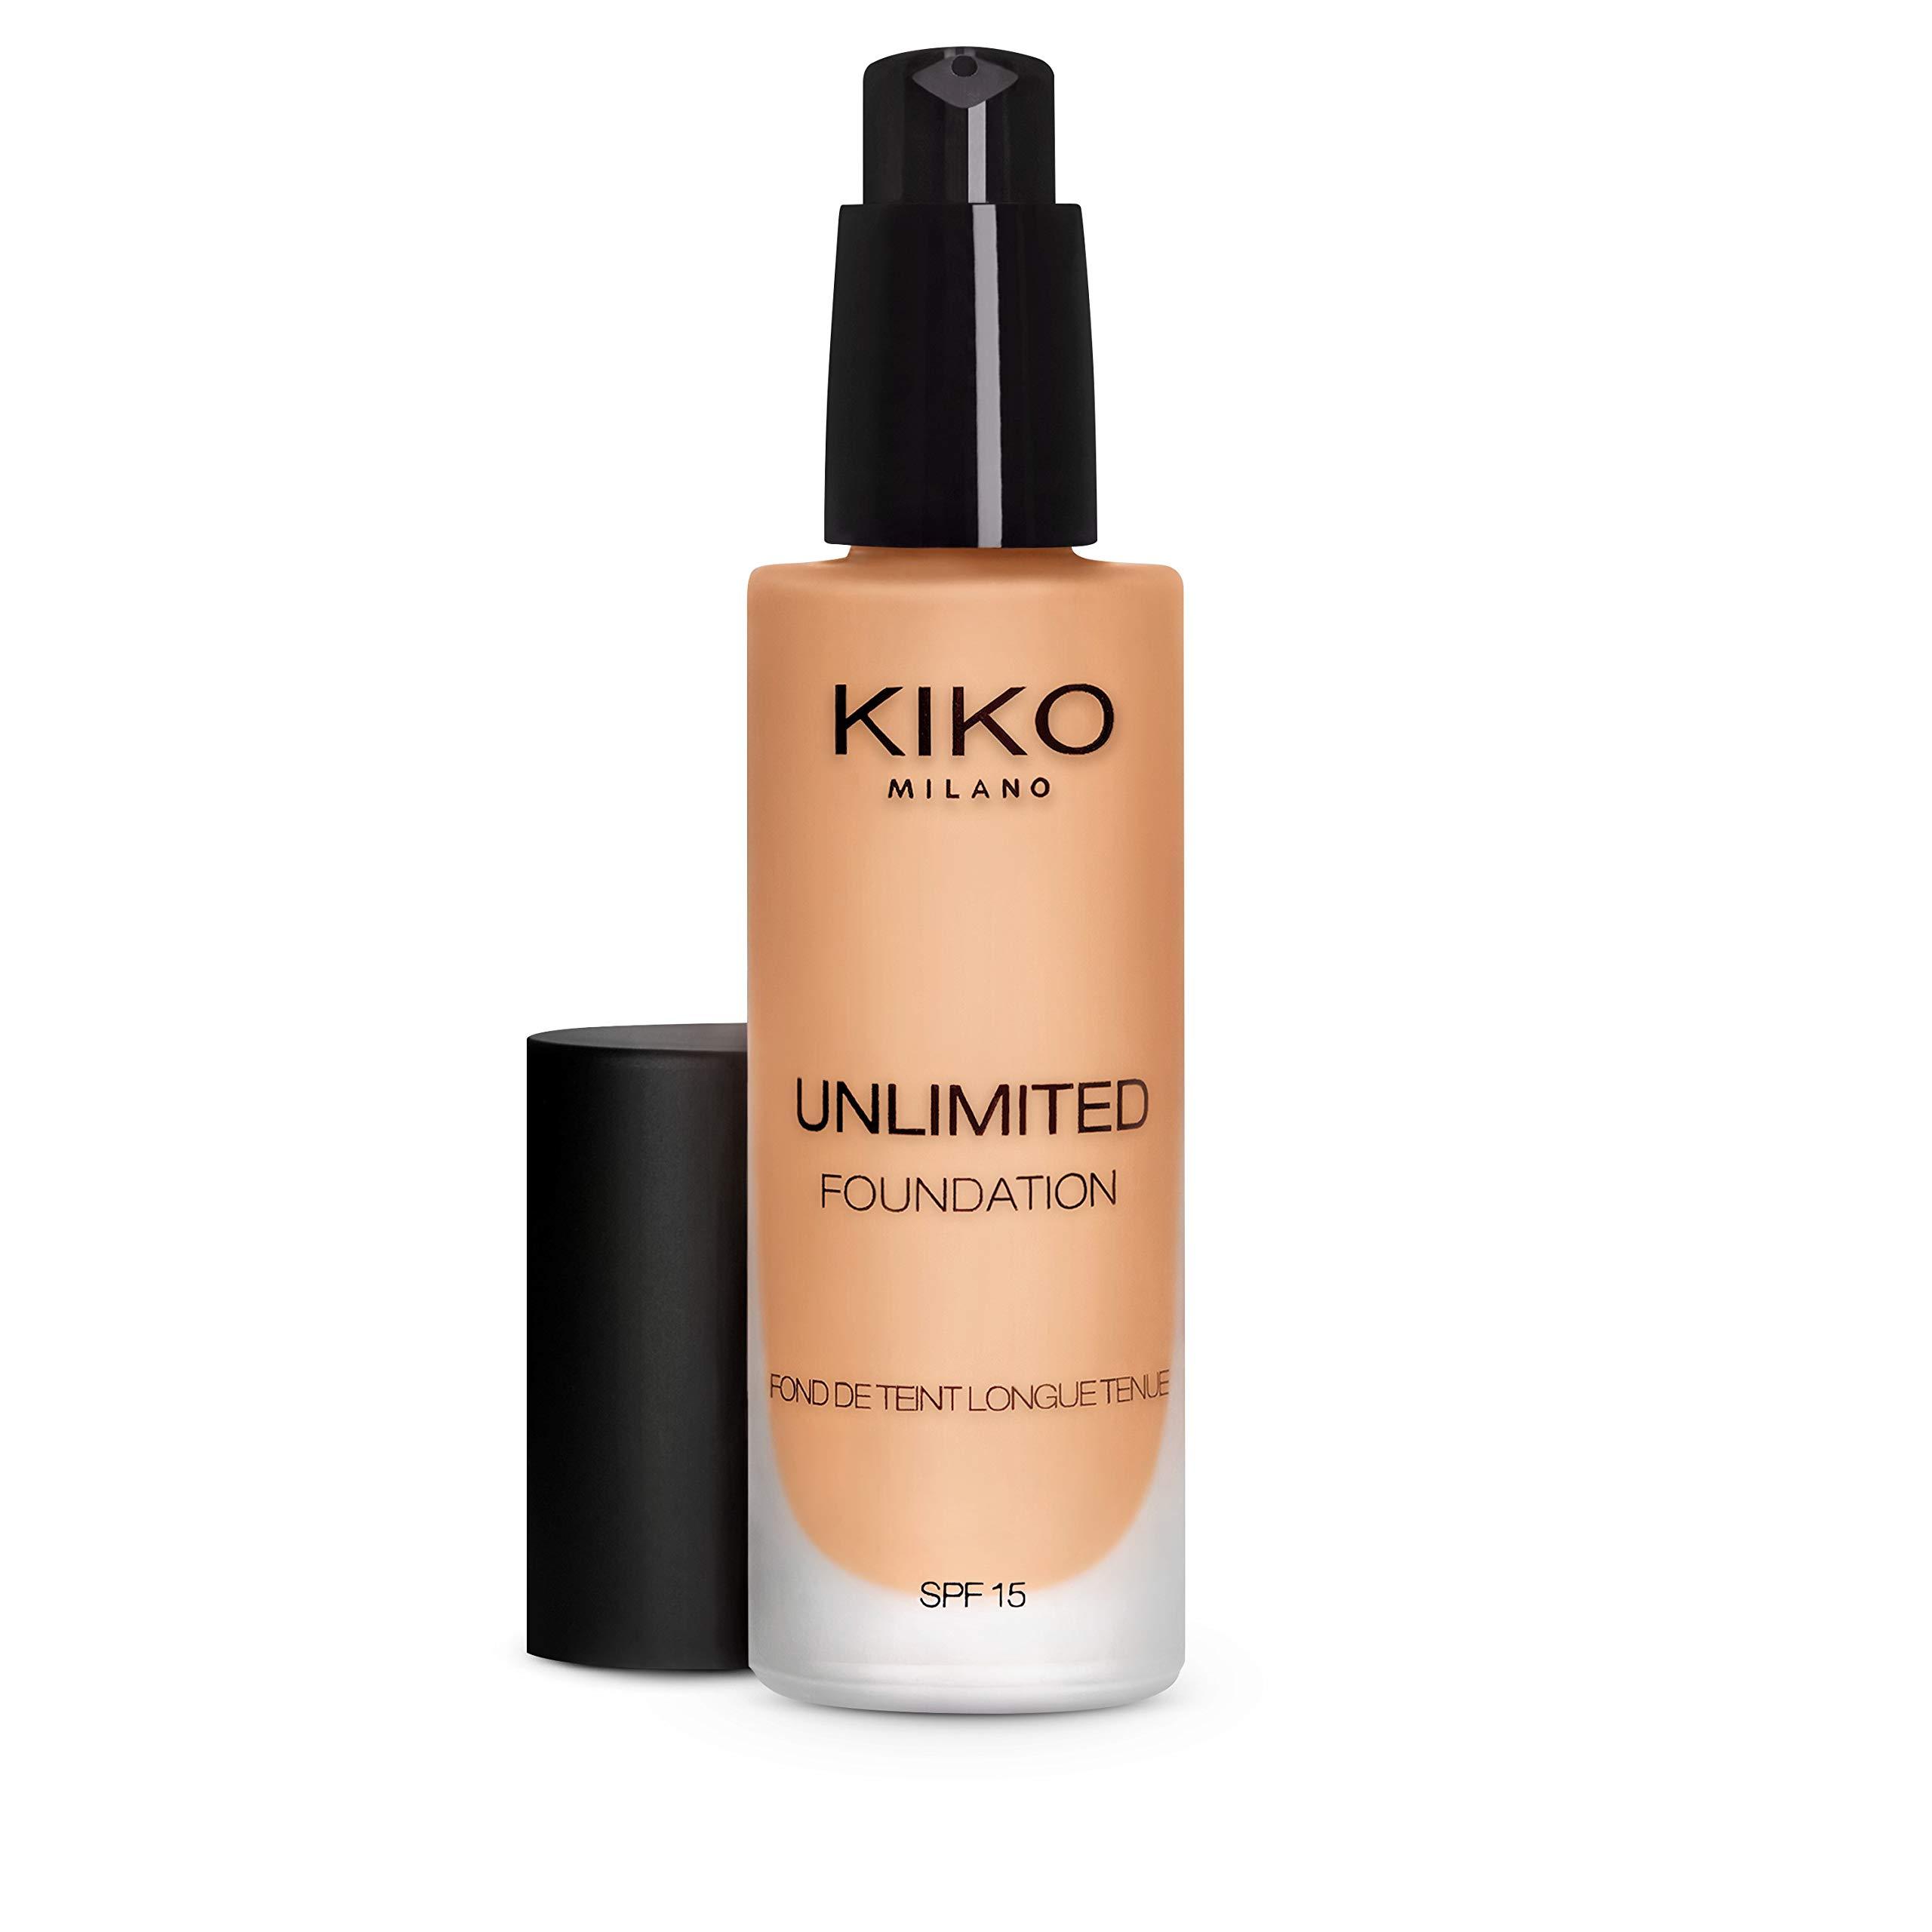 KIKO Milano Unlimited Foundation 10 Face Foundations Neutral 40, 30 ml